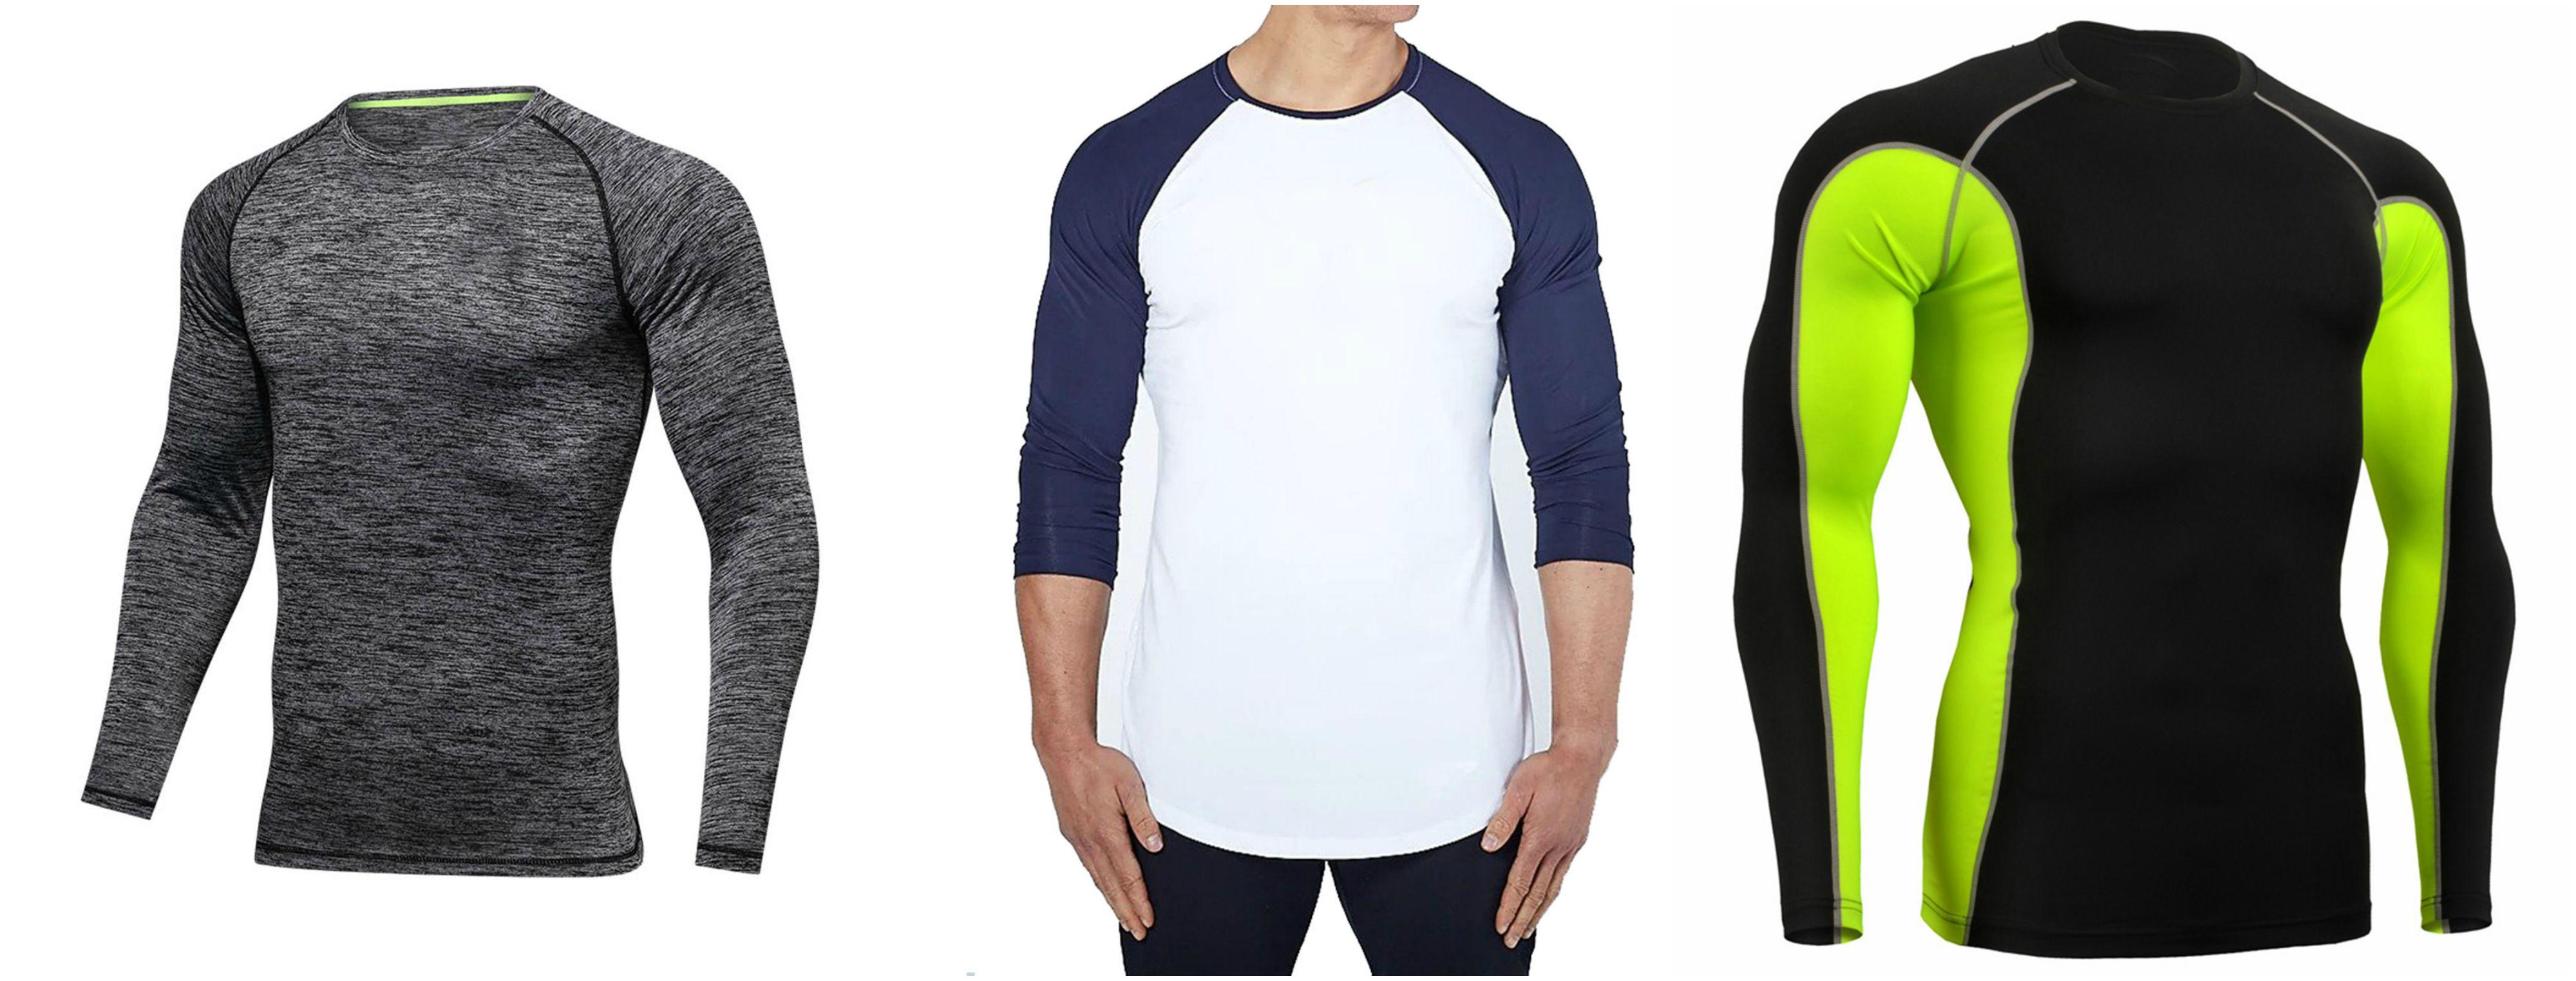 Zesteez Grey Polyester Lycra T-Shirt Pack of 3